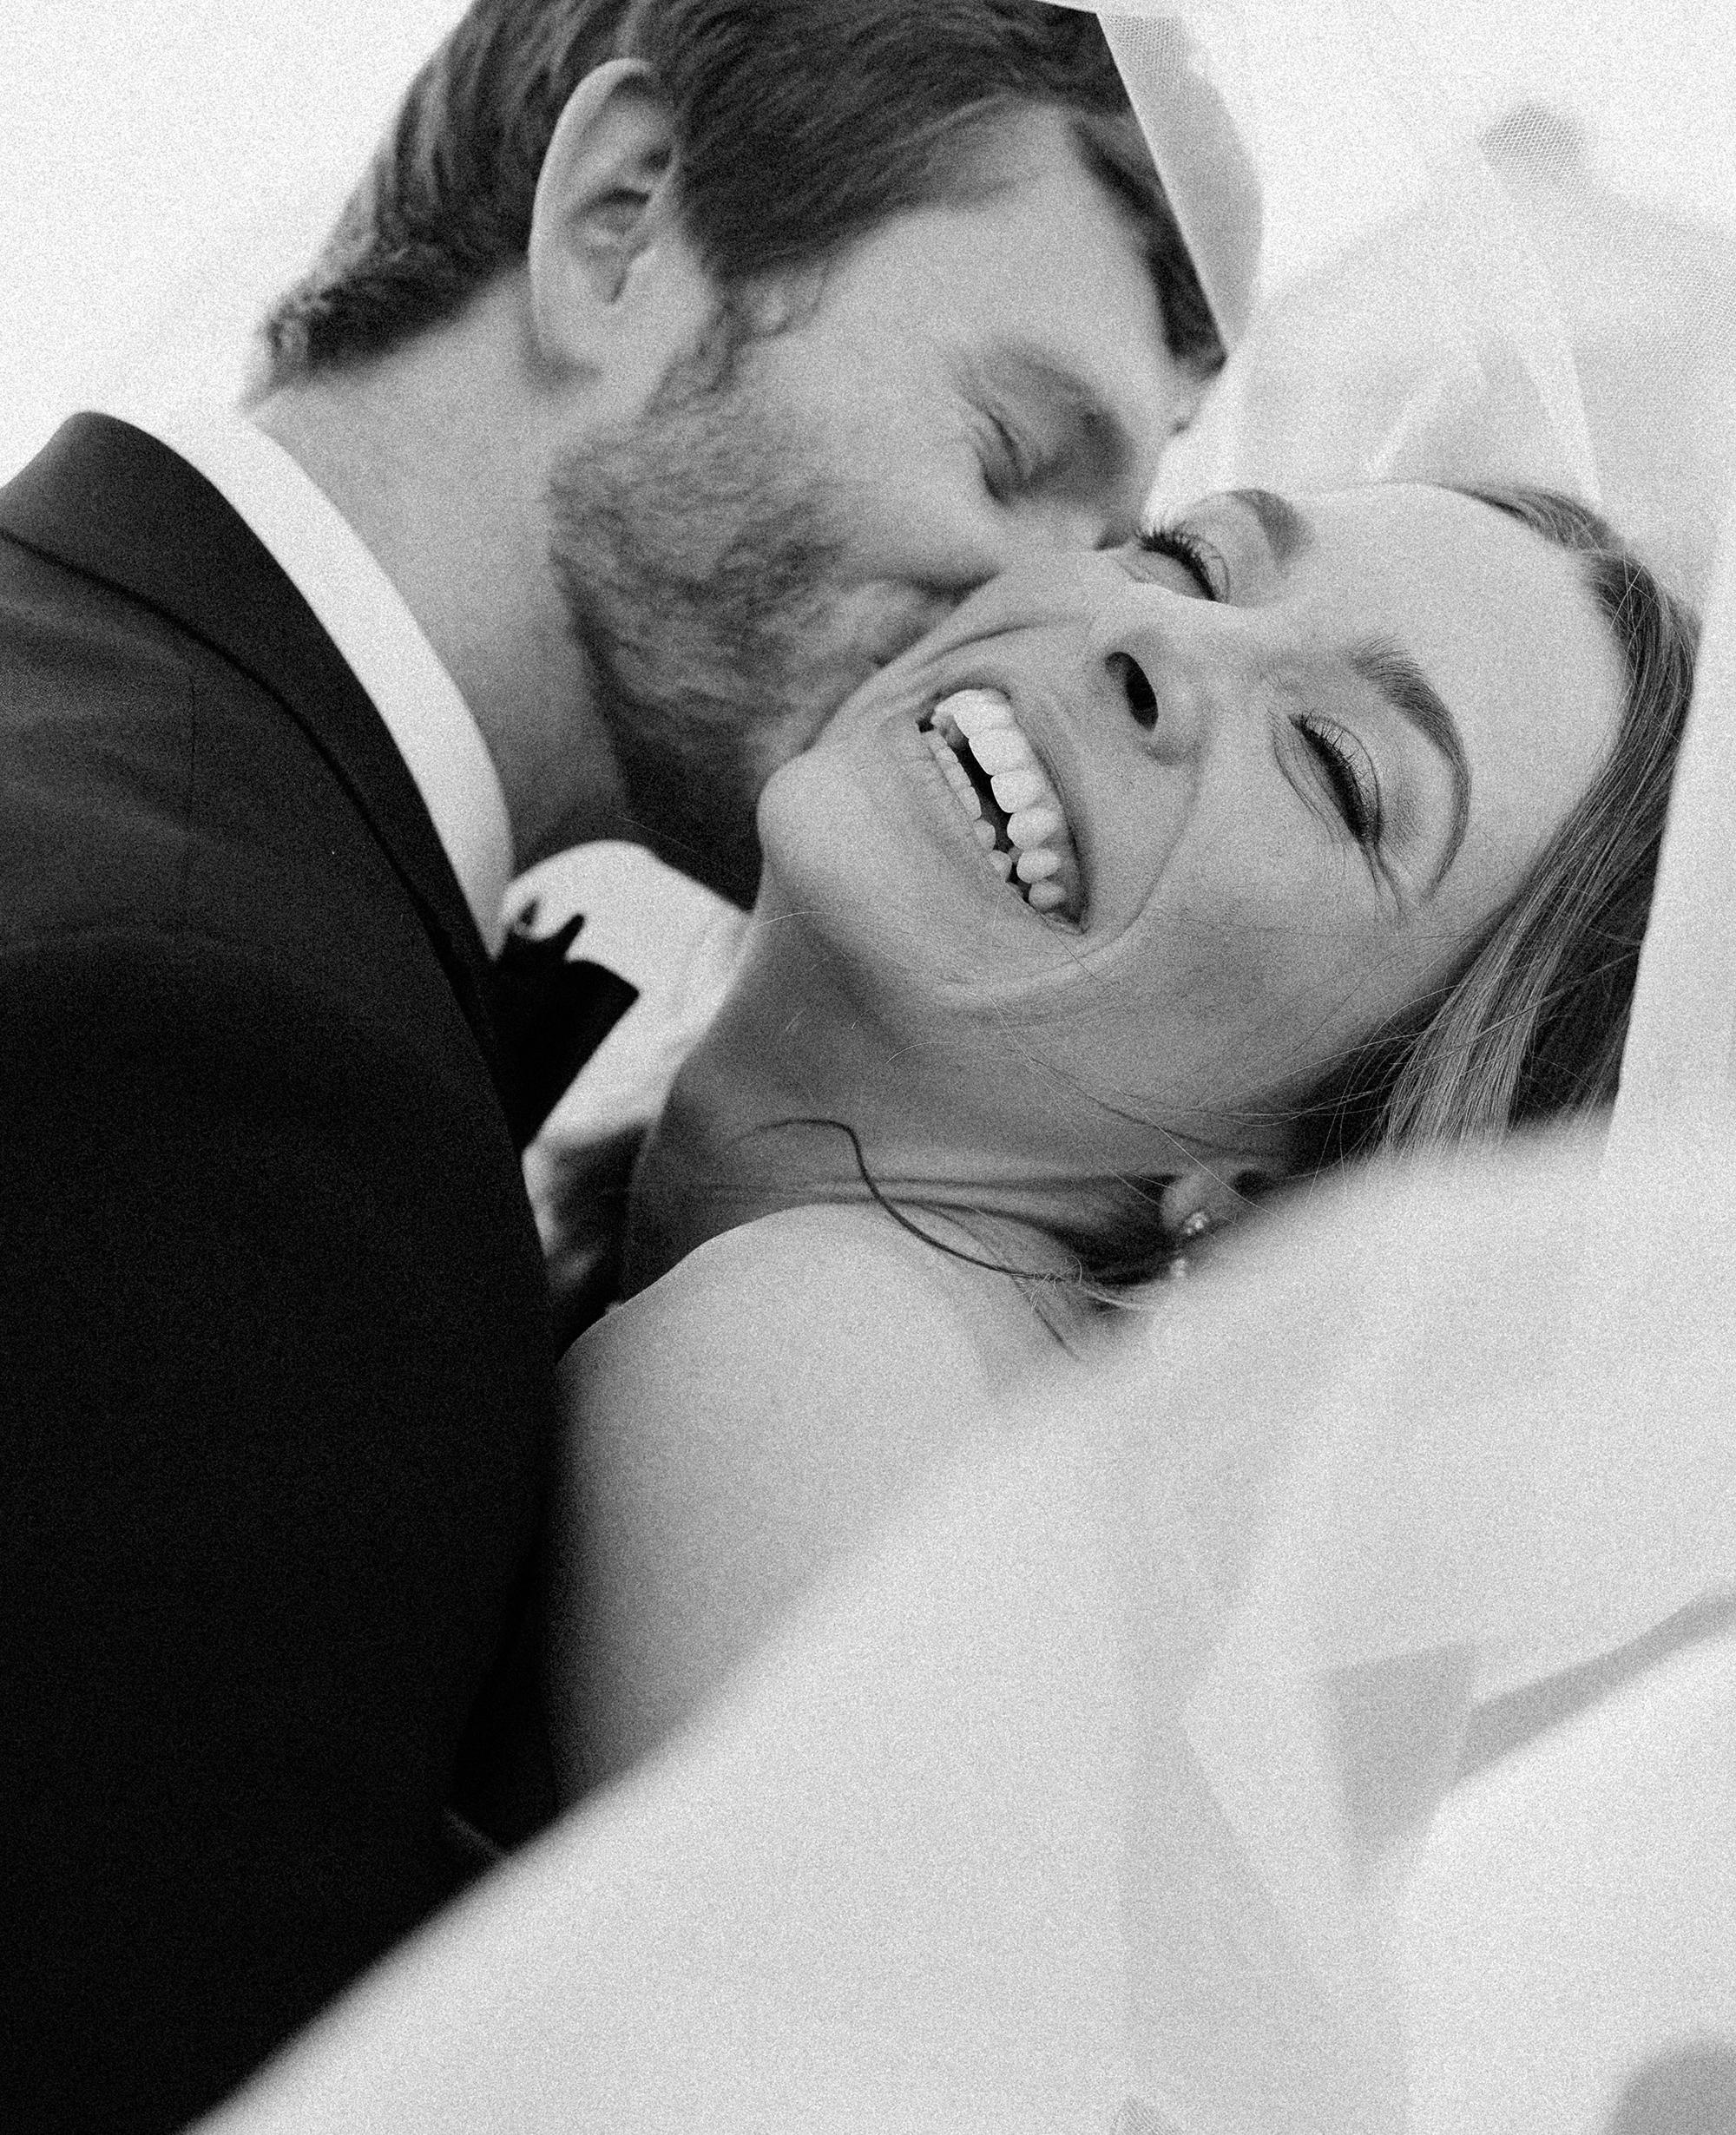 The groom kisses the brides cheek as she laughs at their wedding at venue Deep In The Heart Farms in Brenham, Texas